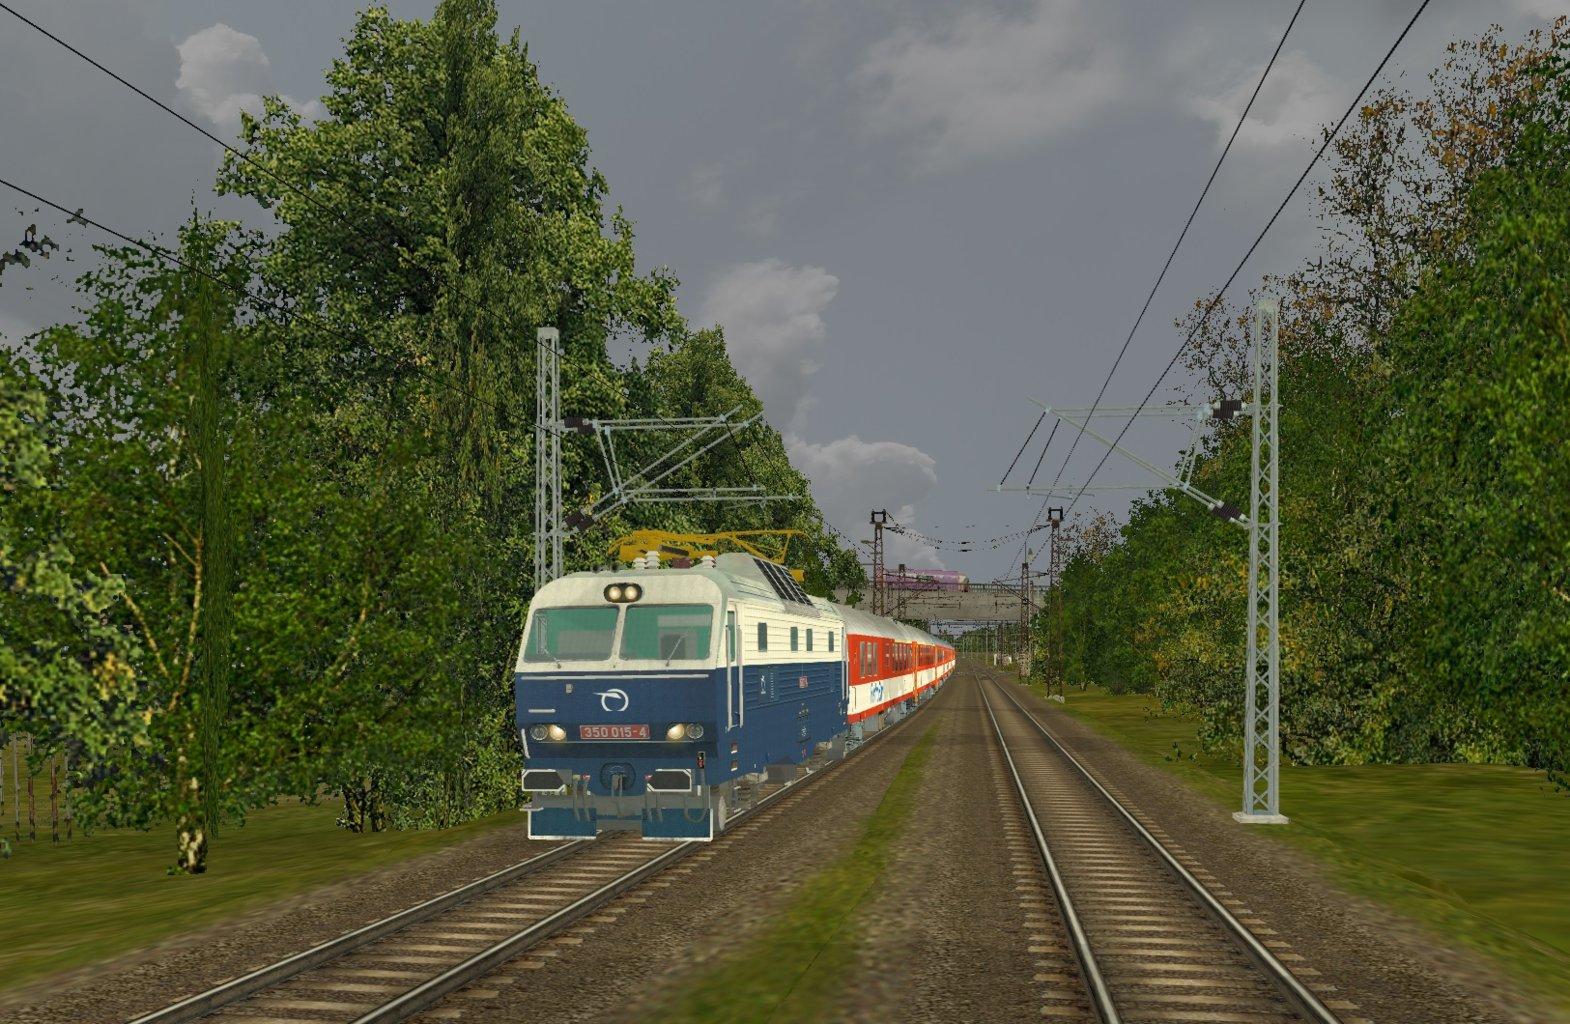 test350mgi1.jpg